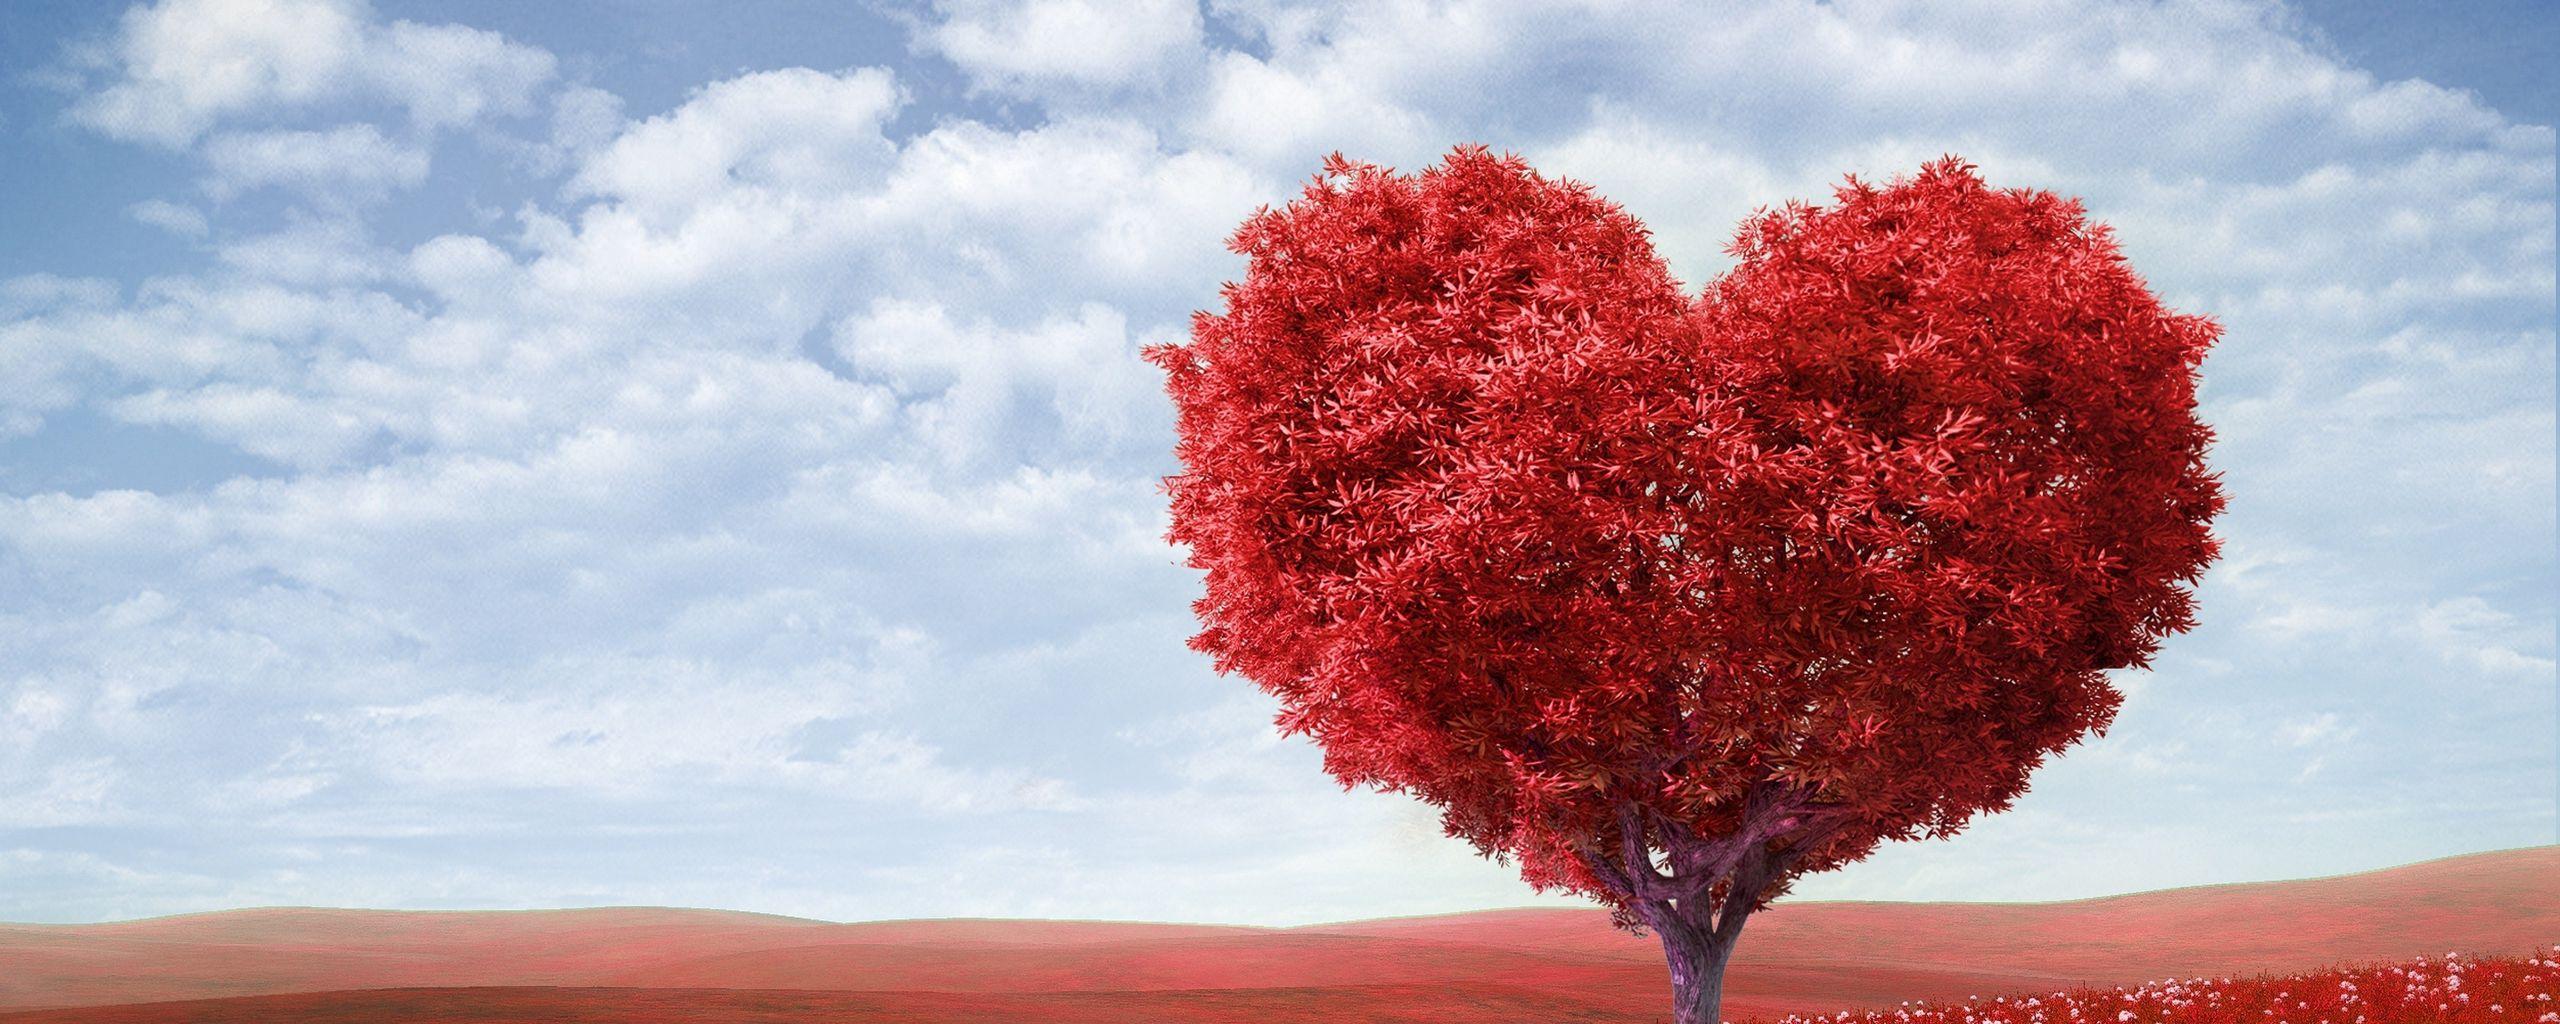 2560x1024 Wallpaper tree, heart, photoshop, field, grass, romance